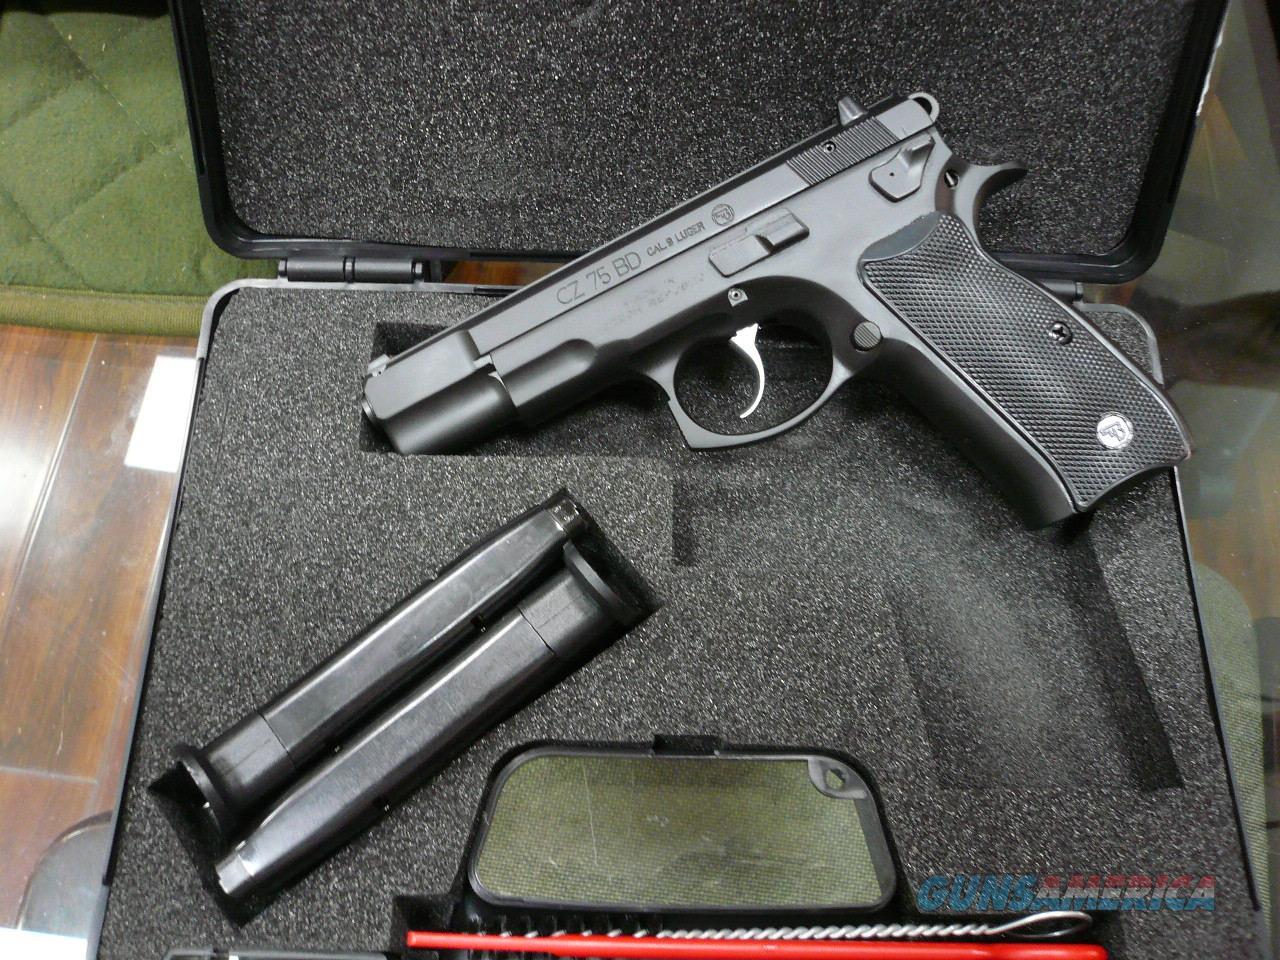 75 BD 9mm NIB  Guns > Pistols > CZ Pistols